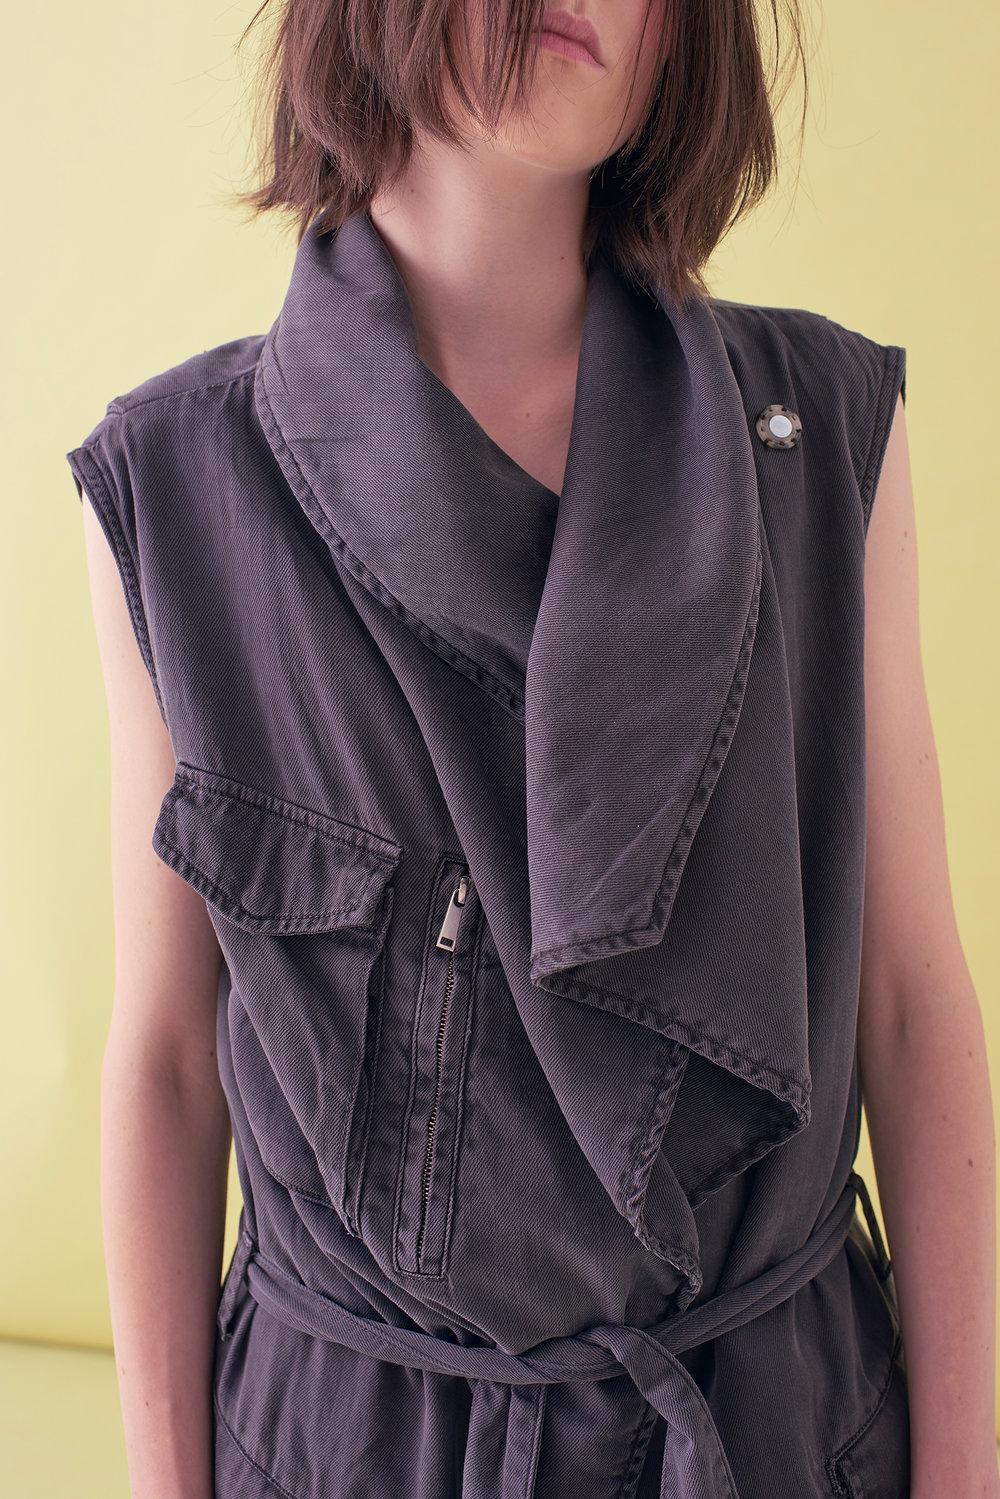 Sarah_Swann_SS17_07_Garment_Dyed_Cotton_Sleeveless_Long_Jacket_Slate_D01.jpg